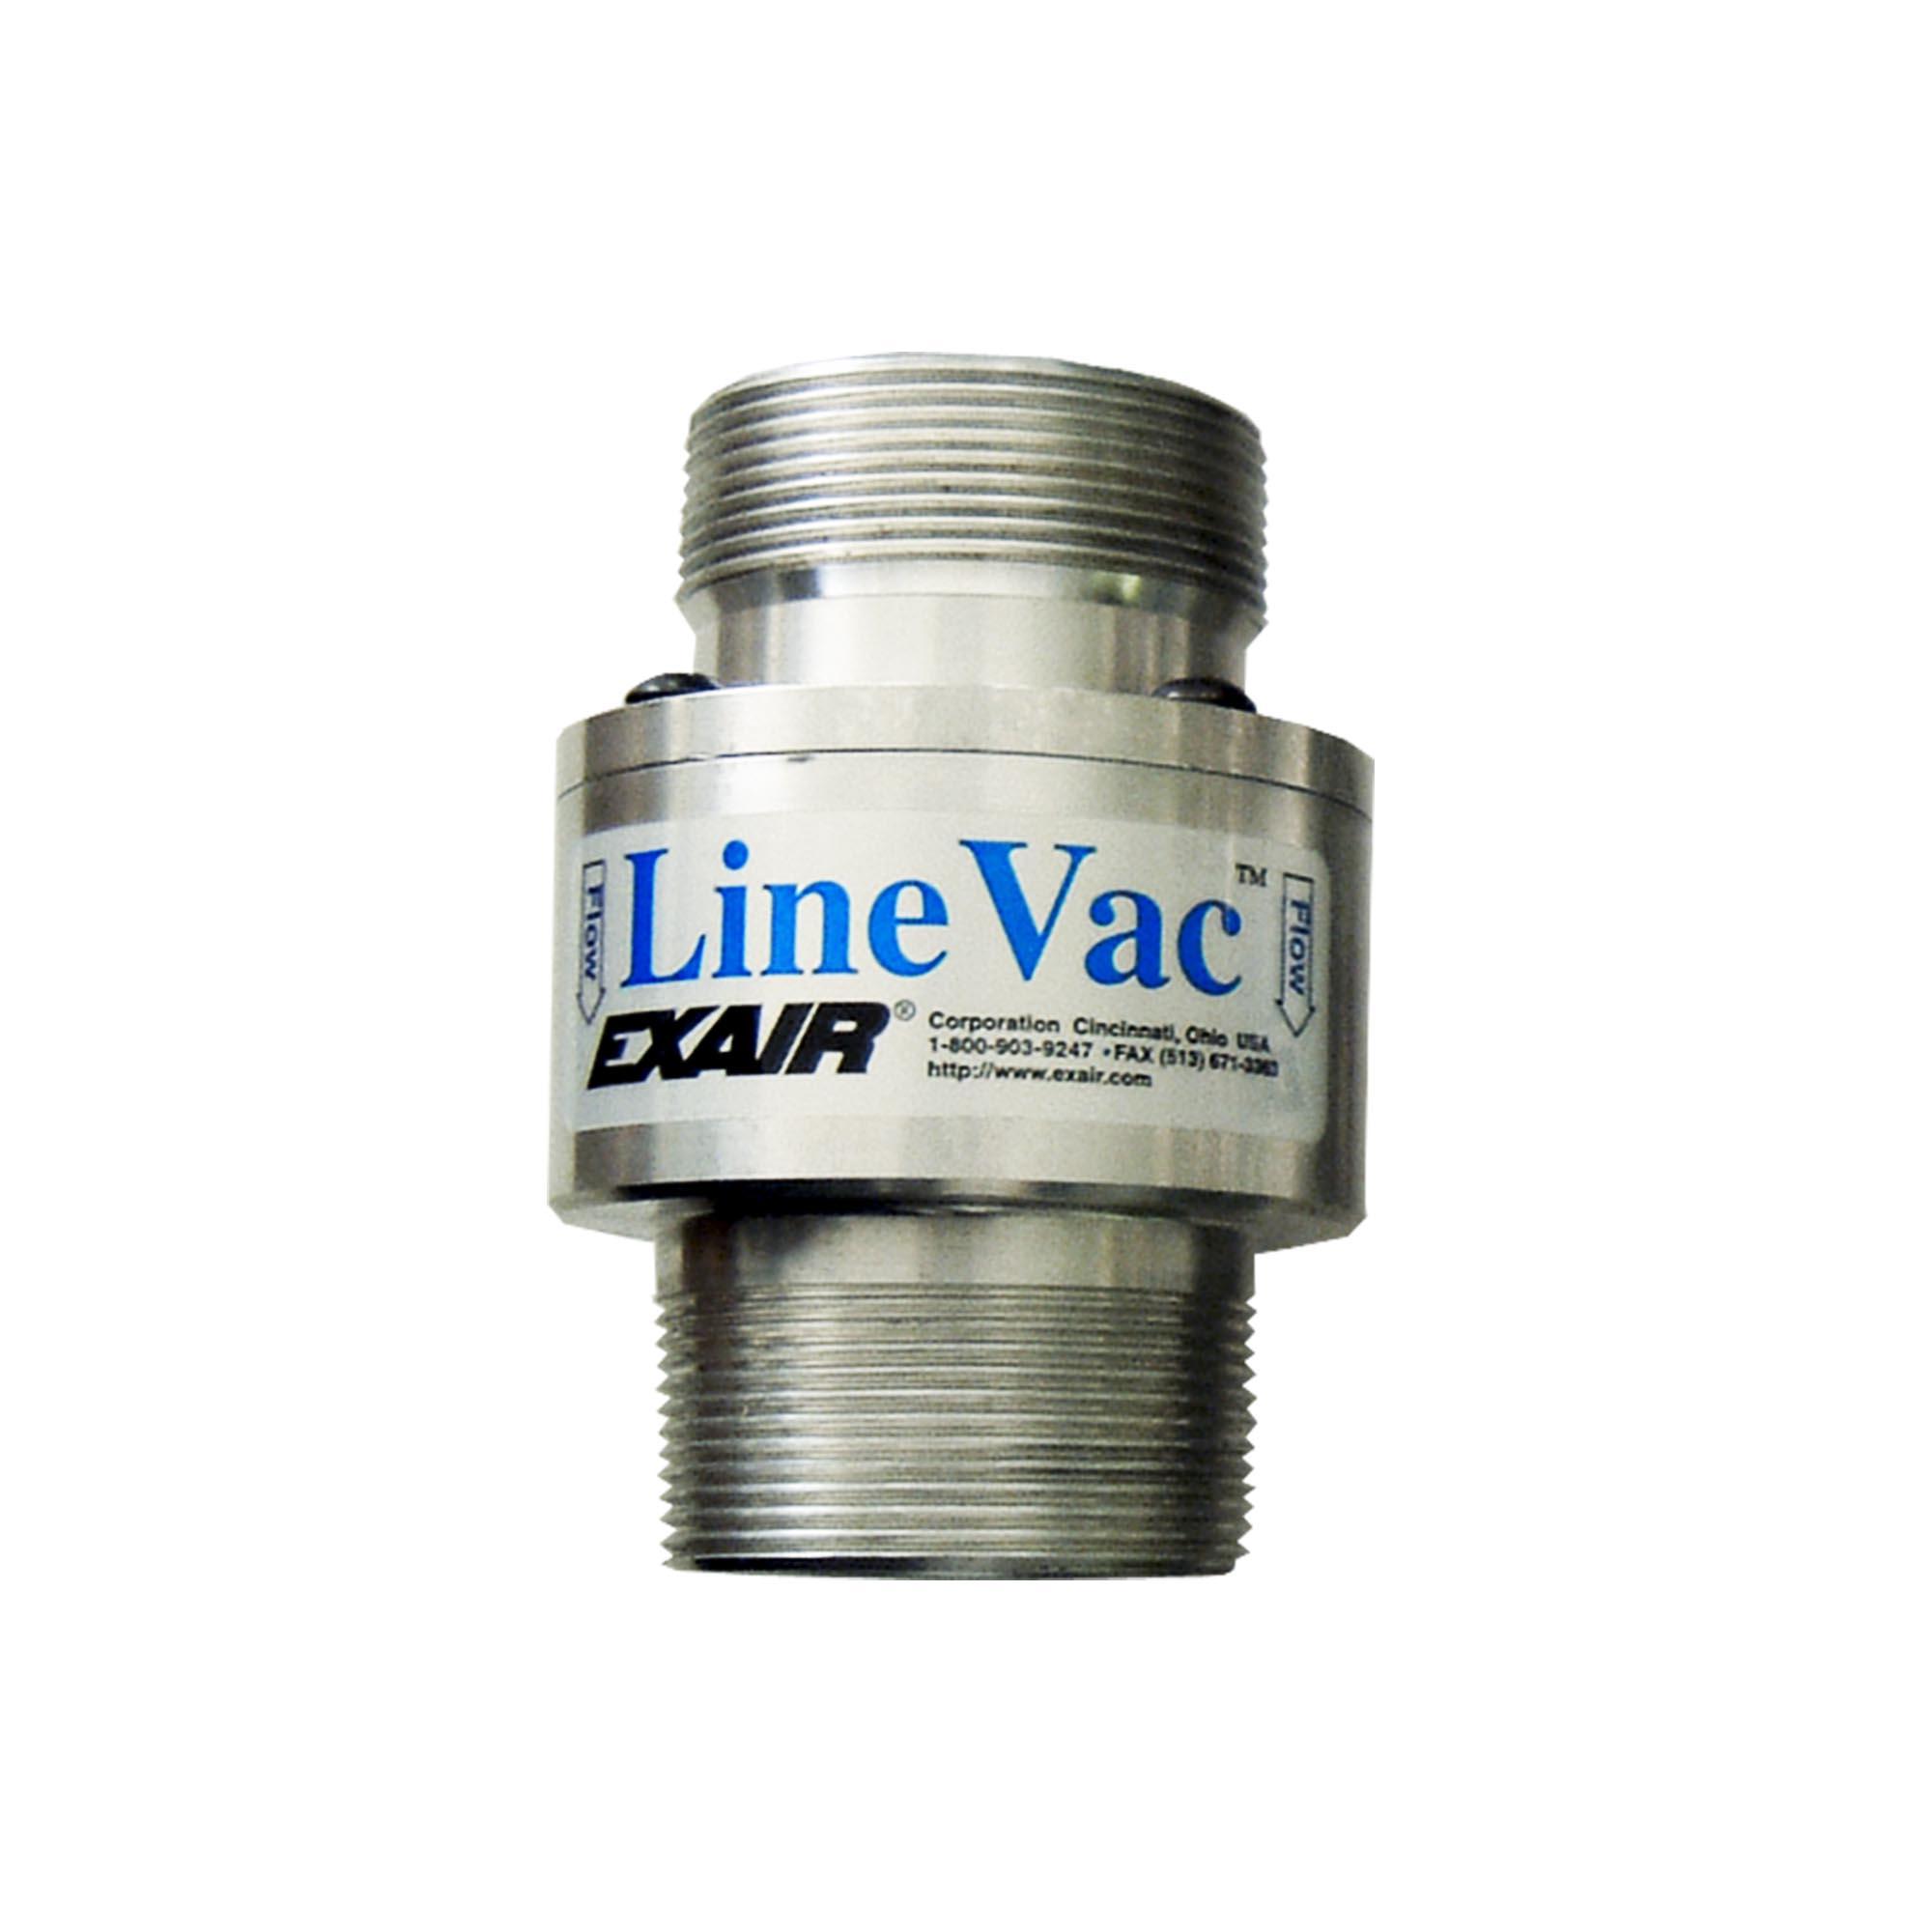 Model 140200 2 NPT Alum. Threaded Line Vac